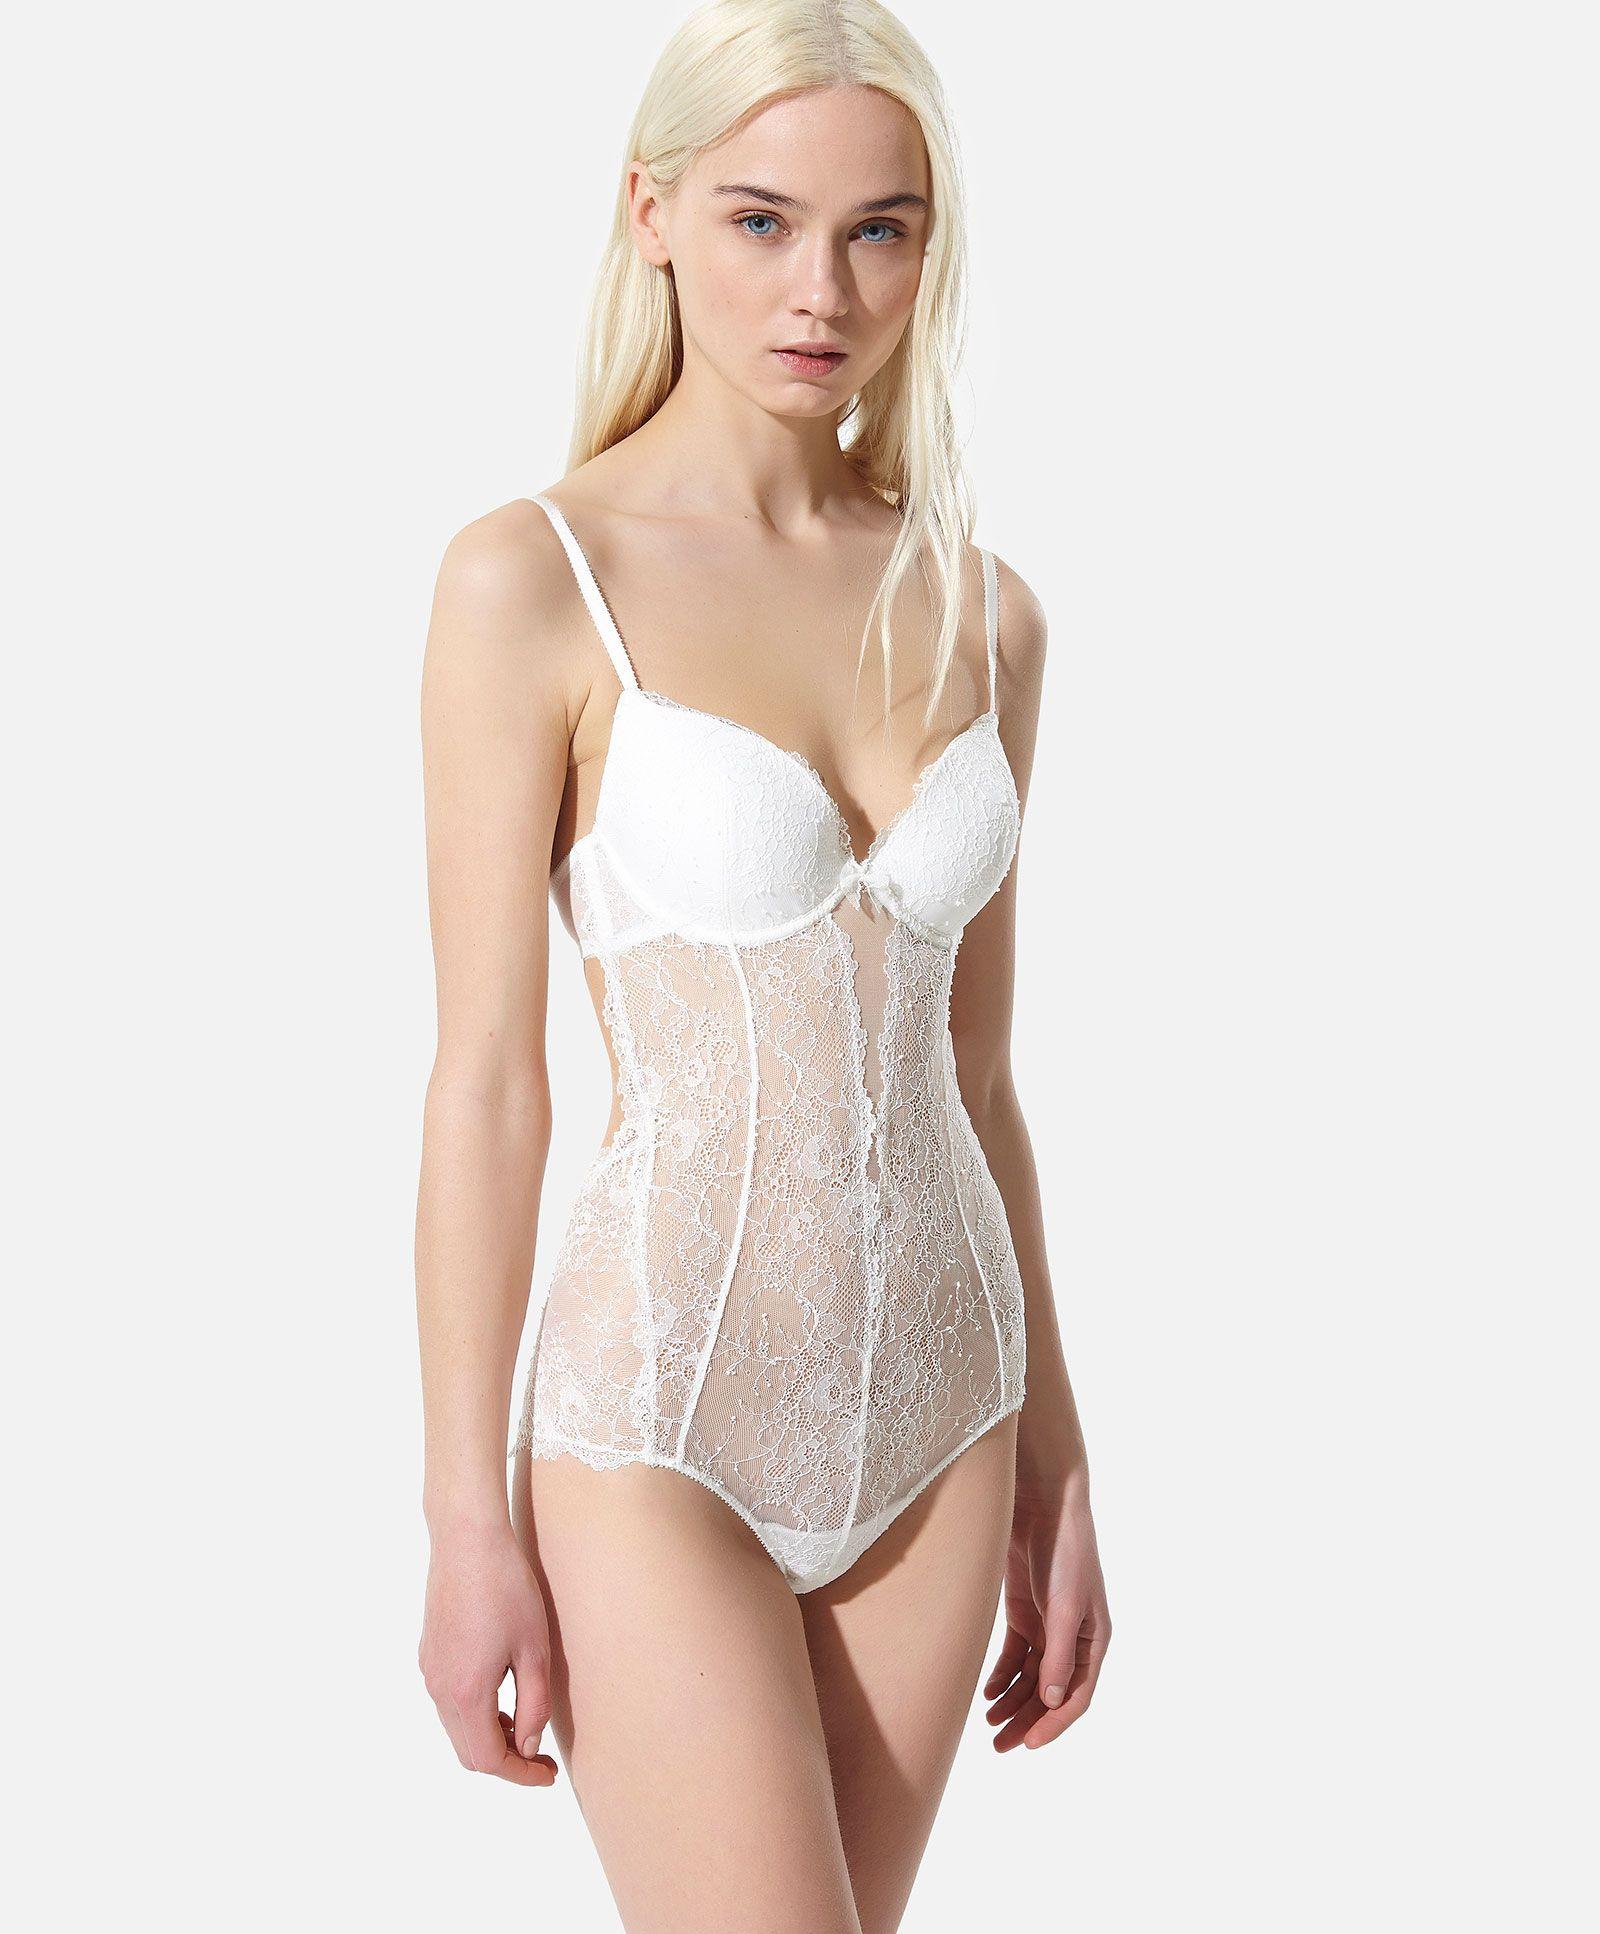 e0ea58b2e8b55 Body com enchimento renda floral - OYSHO | lingerie | Lace bodysuit ...